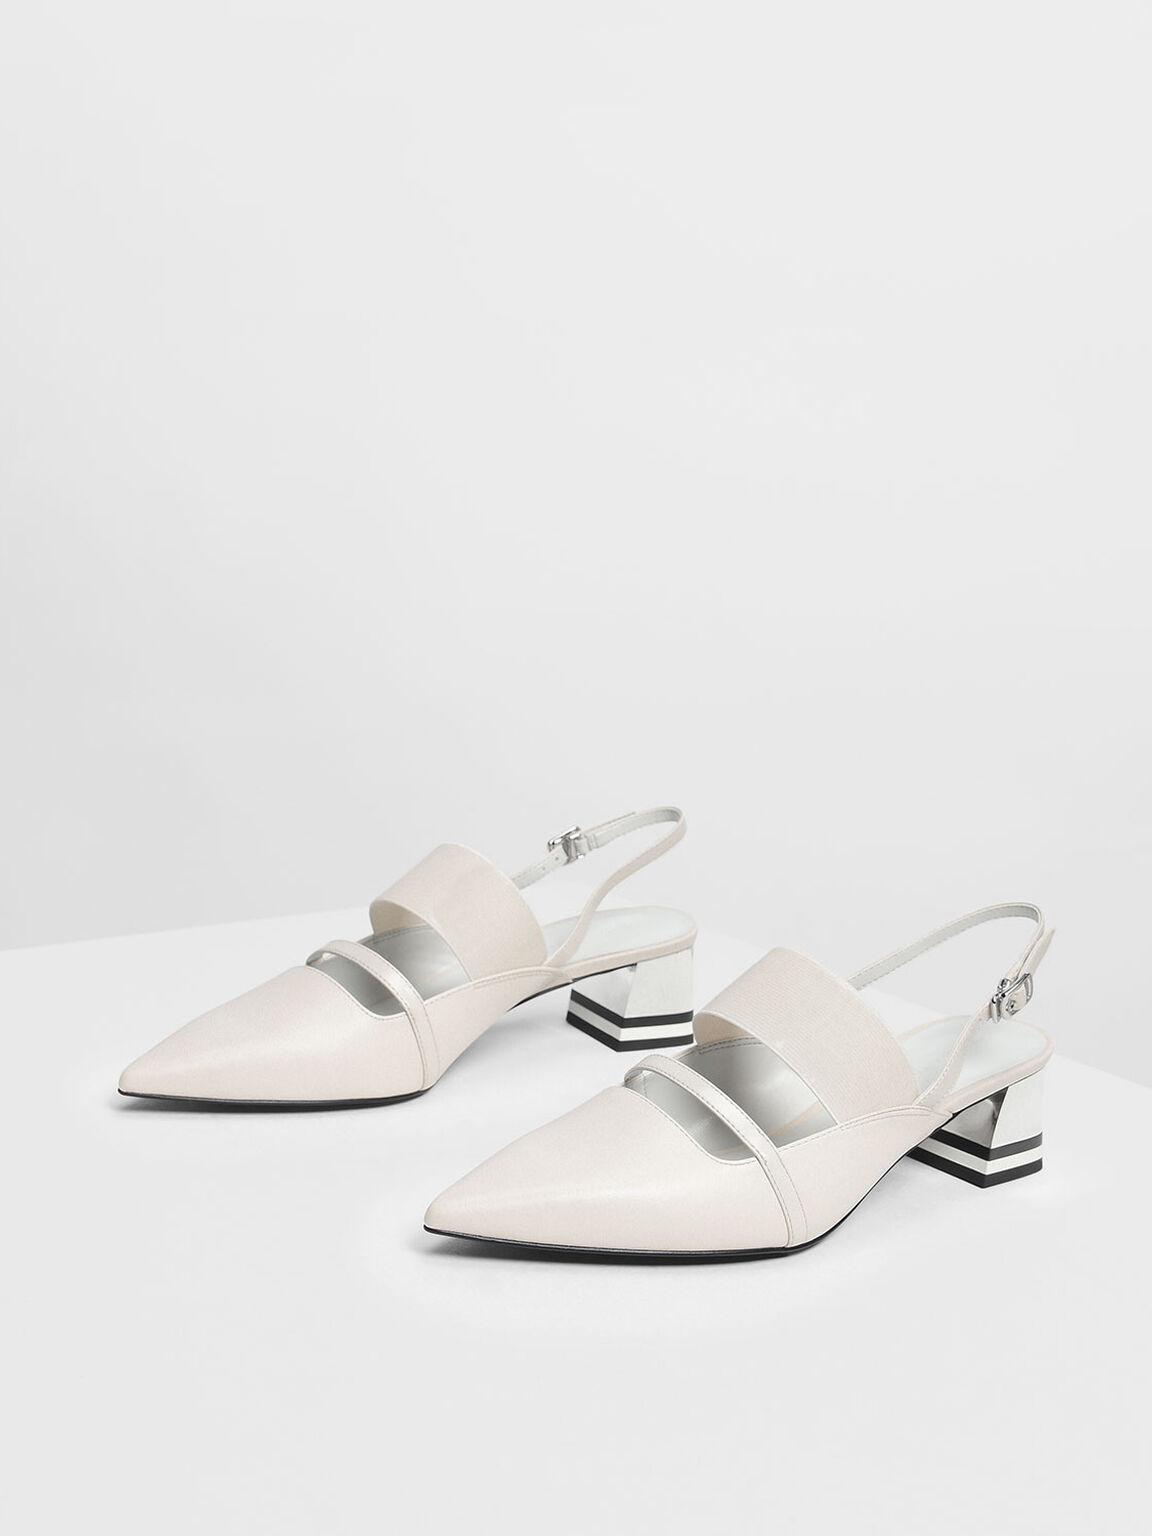 Pointed Toe Slingback Heels, Chalk, hi-res